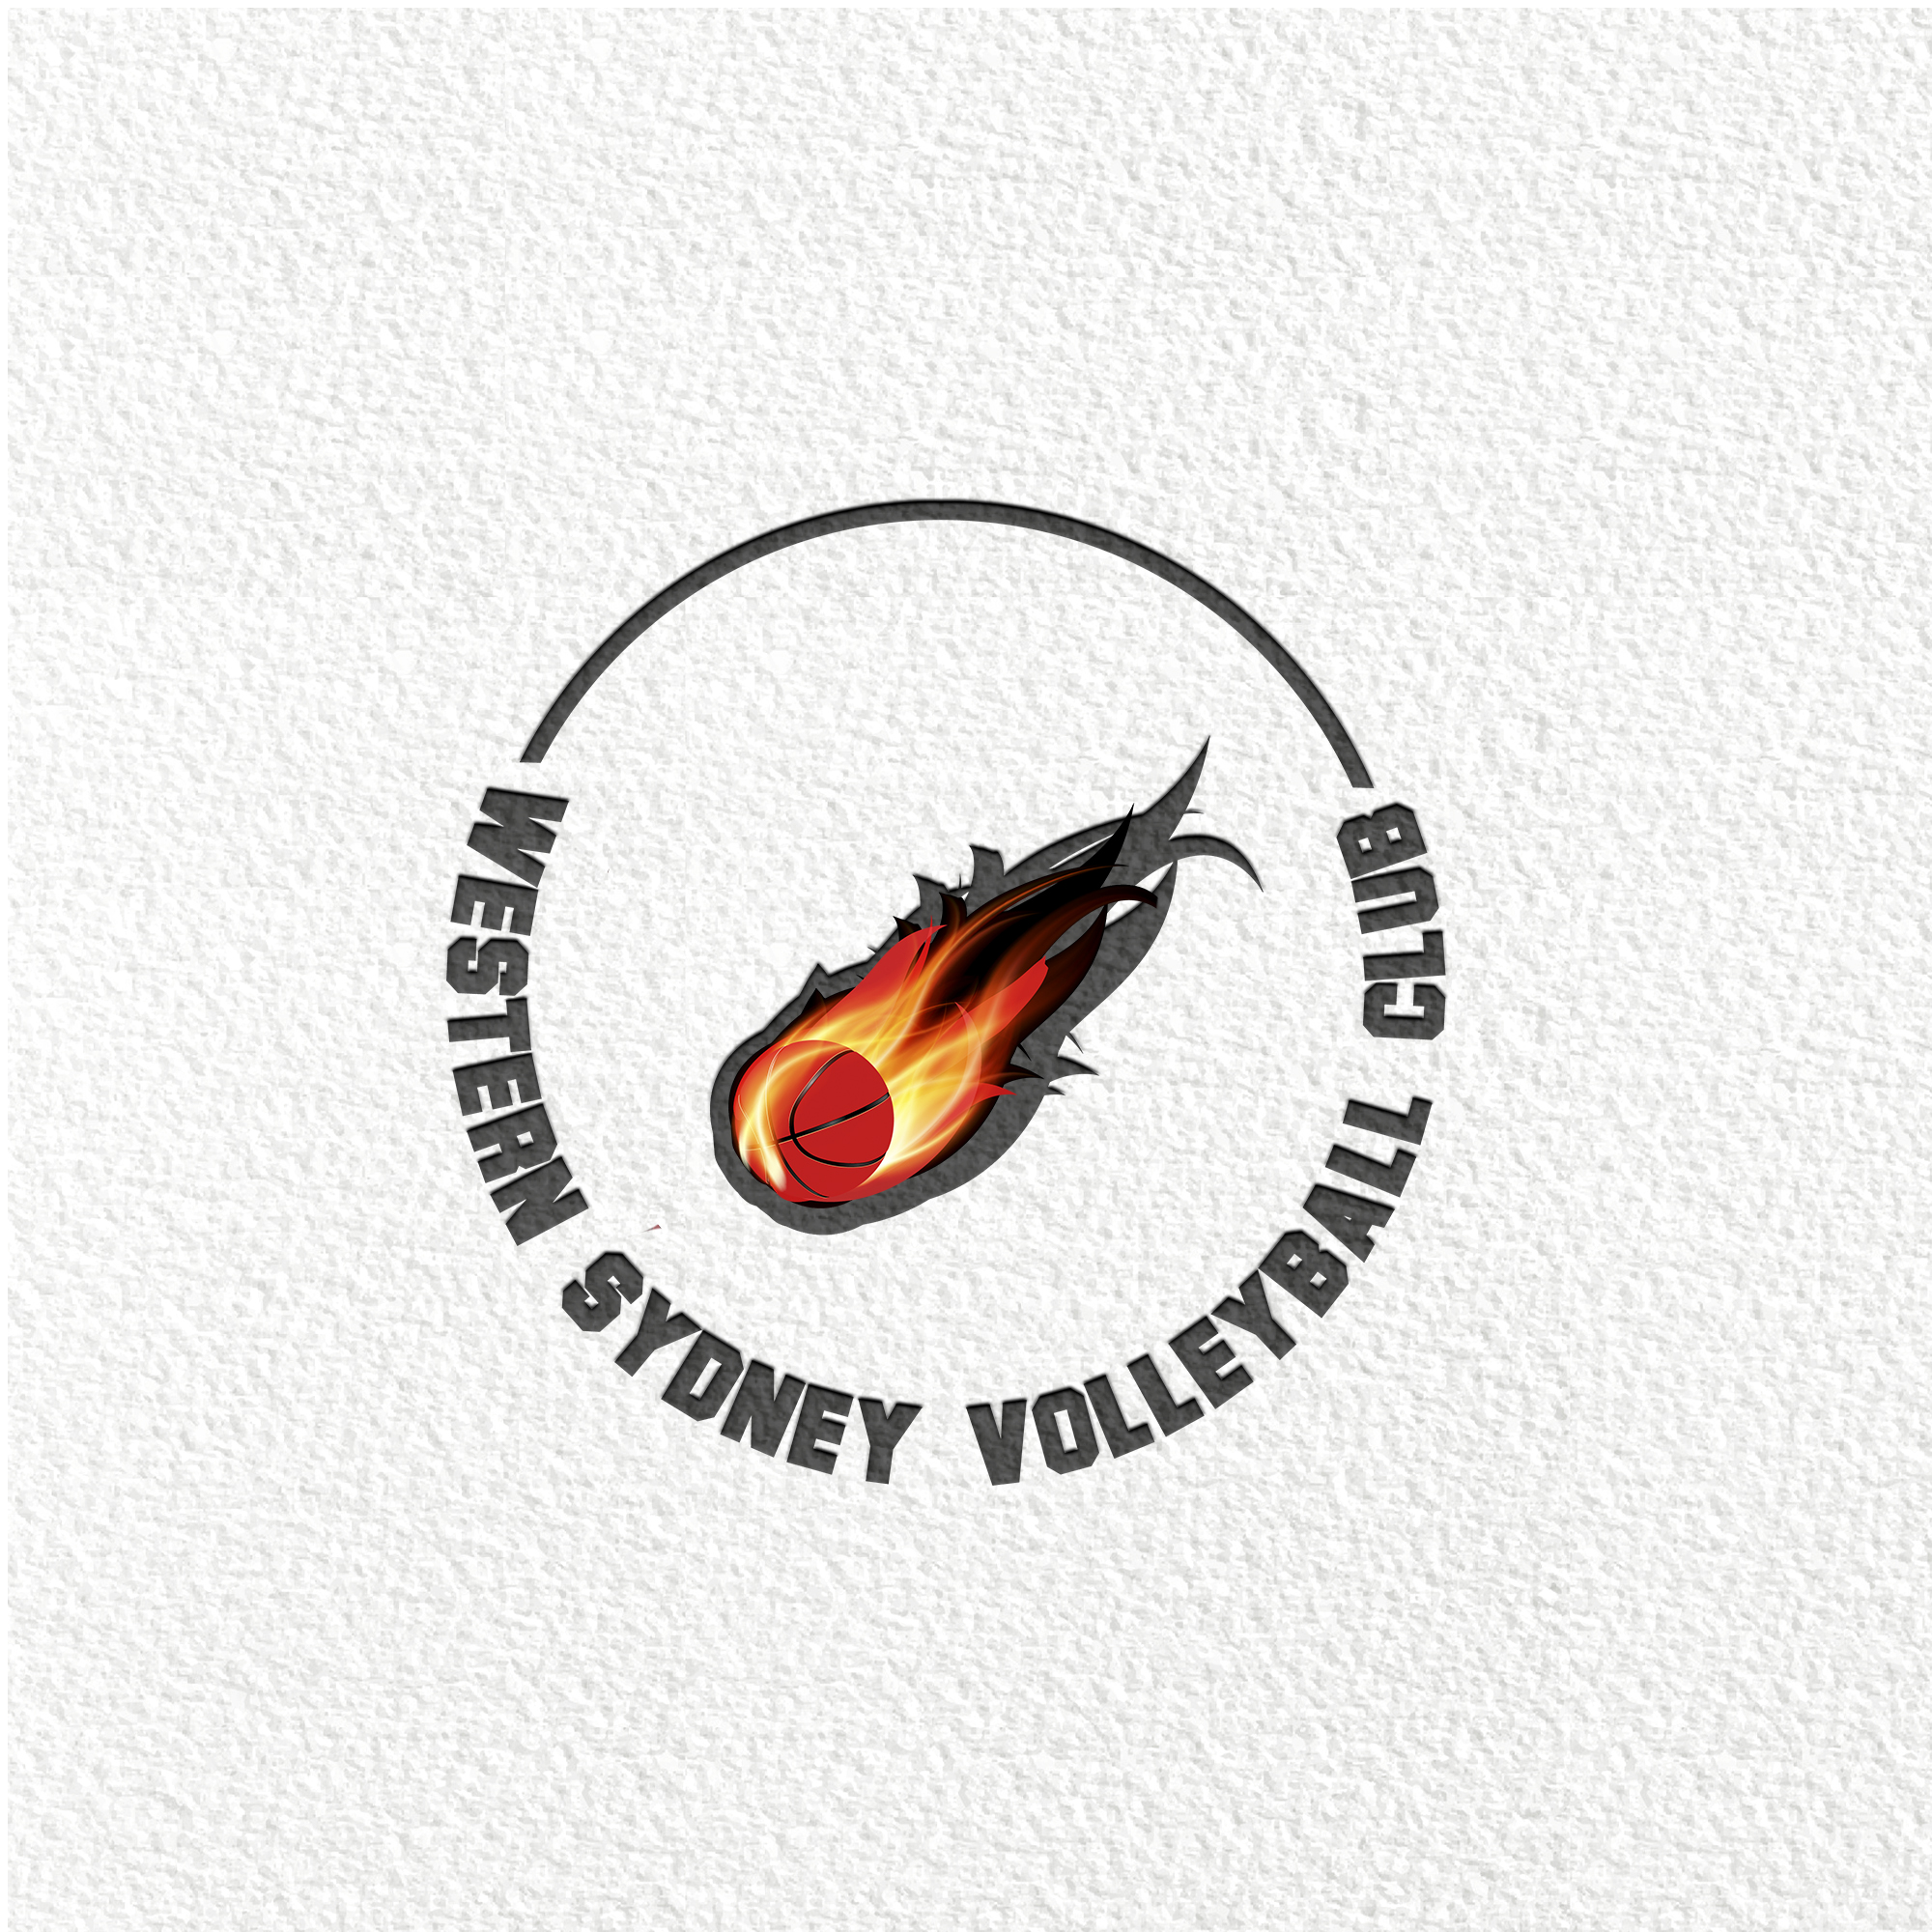 I will do a Awesome Logo high quality 300 dpi with 24 hours